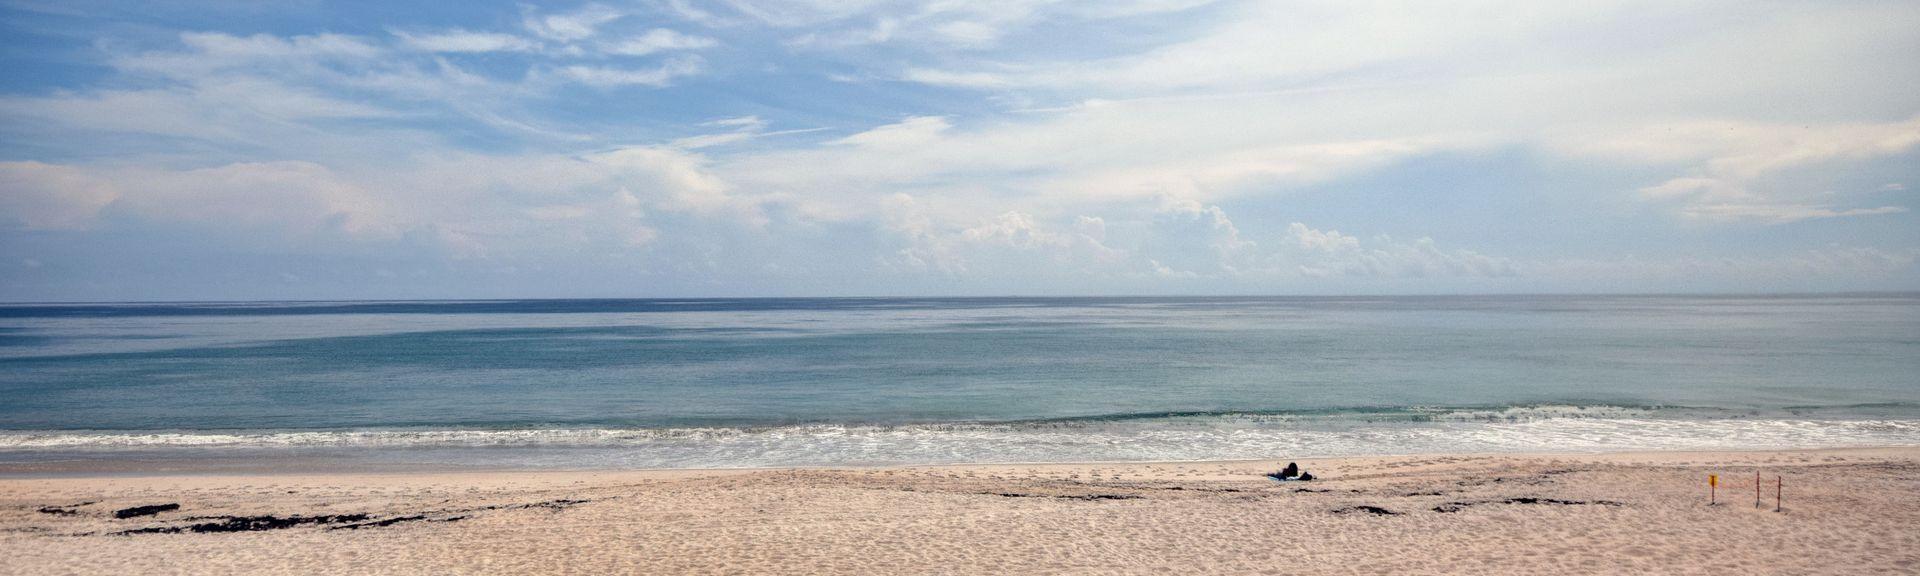 Central Beach, Vero Beach, Flórida, Estados Unidos